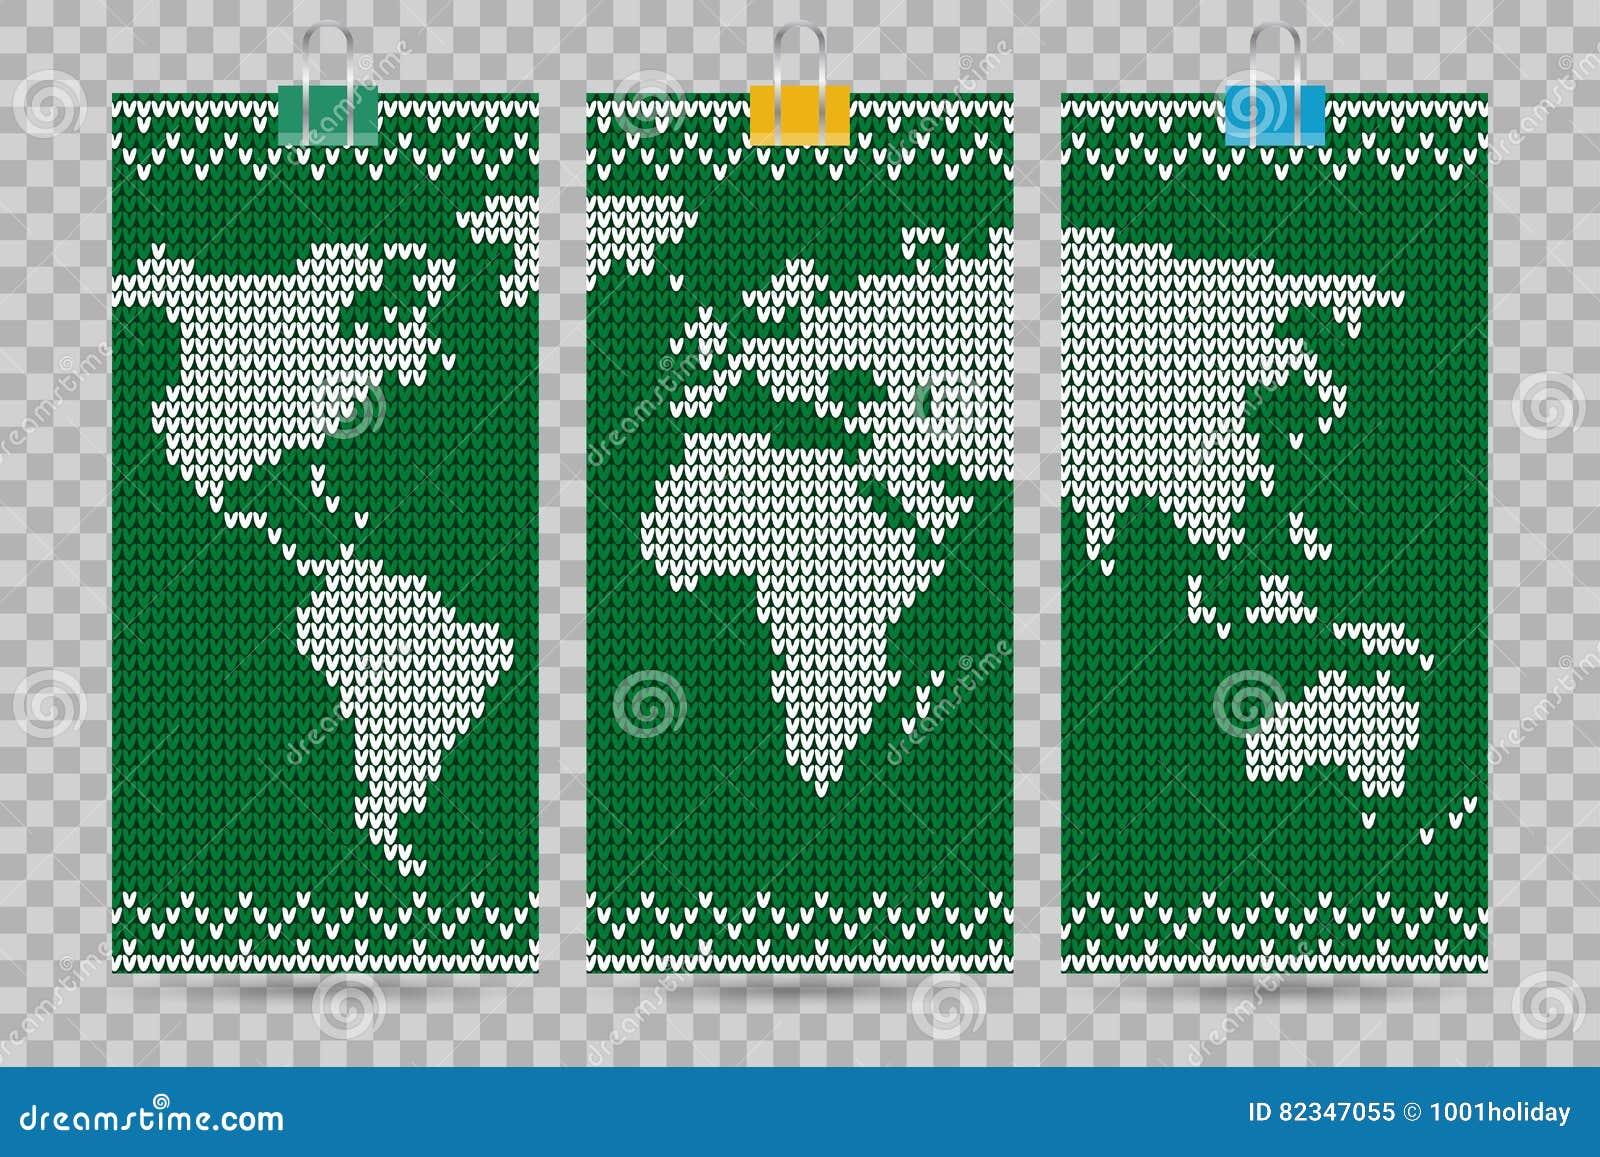 Vector world map business cards set green knitting style stock vector world map business cards set green knitting style magicingreecefo Image collections